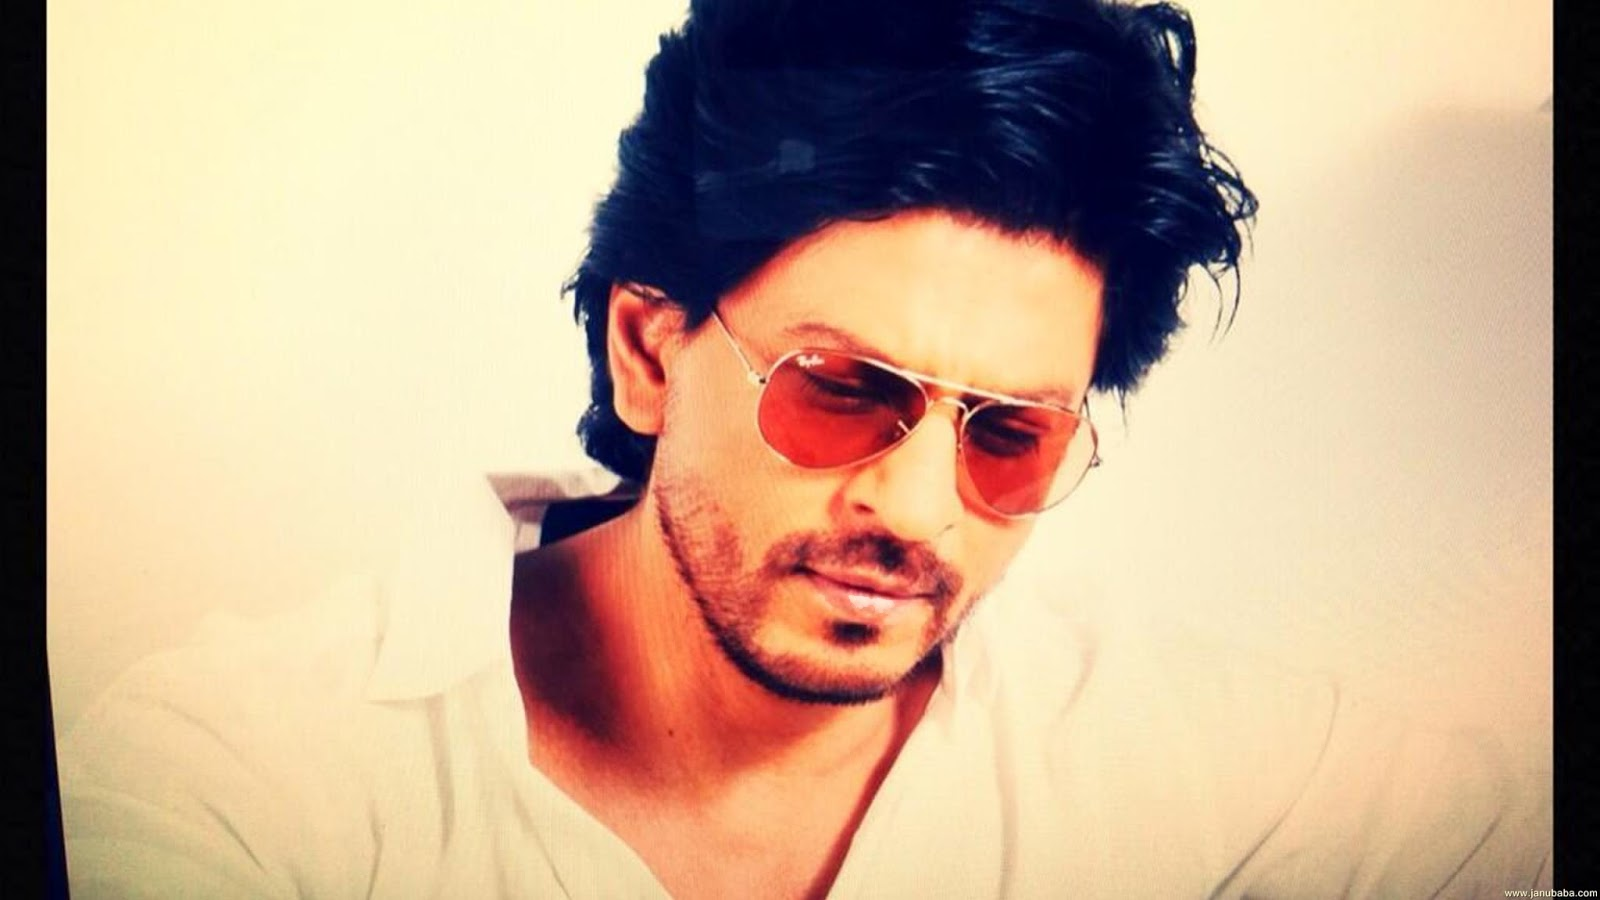 Wallpaper download bollywood actors - Bollywood Actor Shahrukh Khan Latest Hd Wallpaper 2016